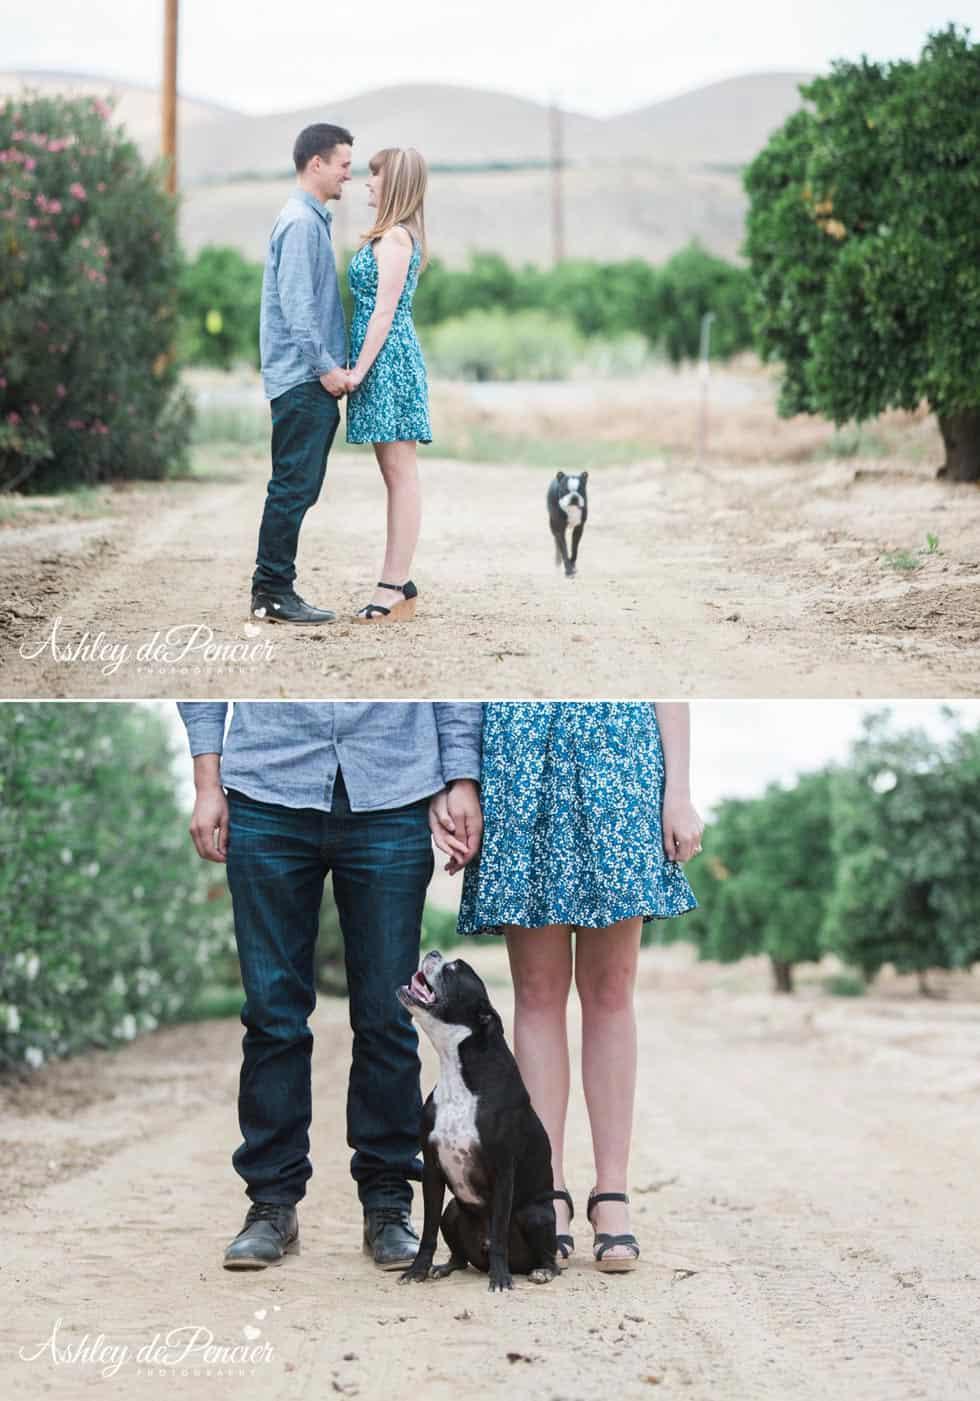 Engagement portraits taken in Orange Grove, California